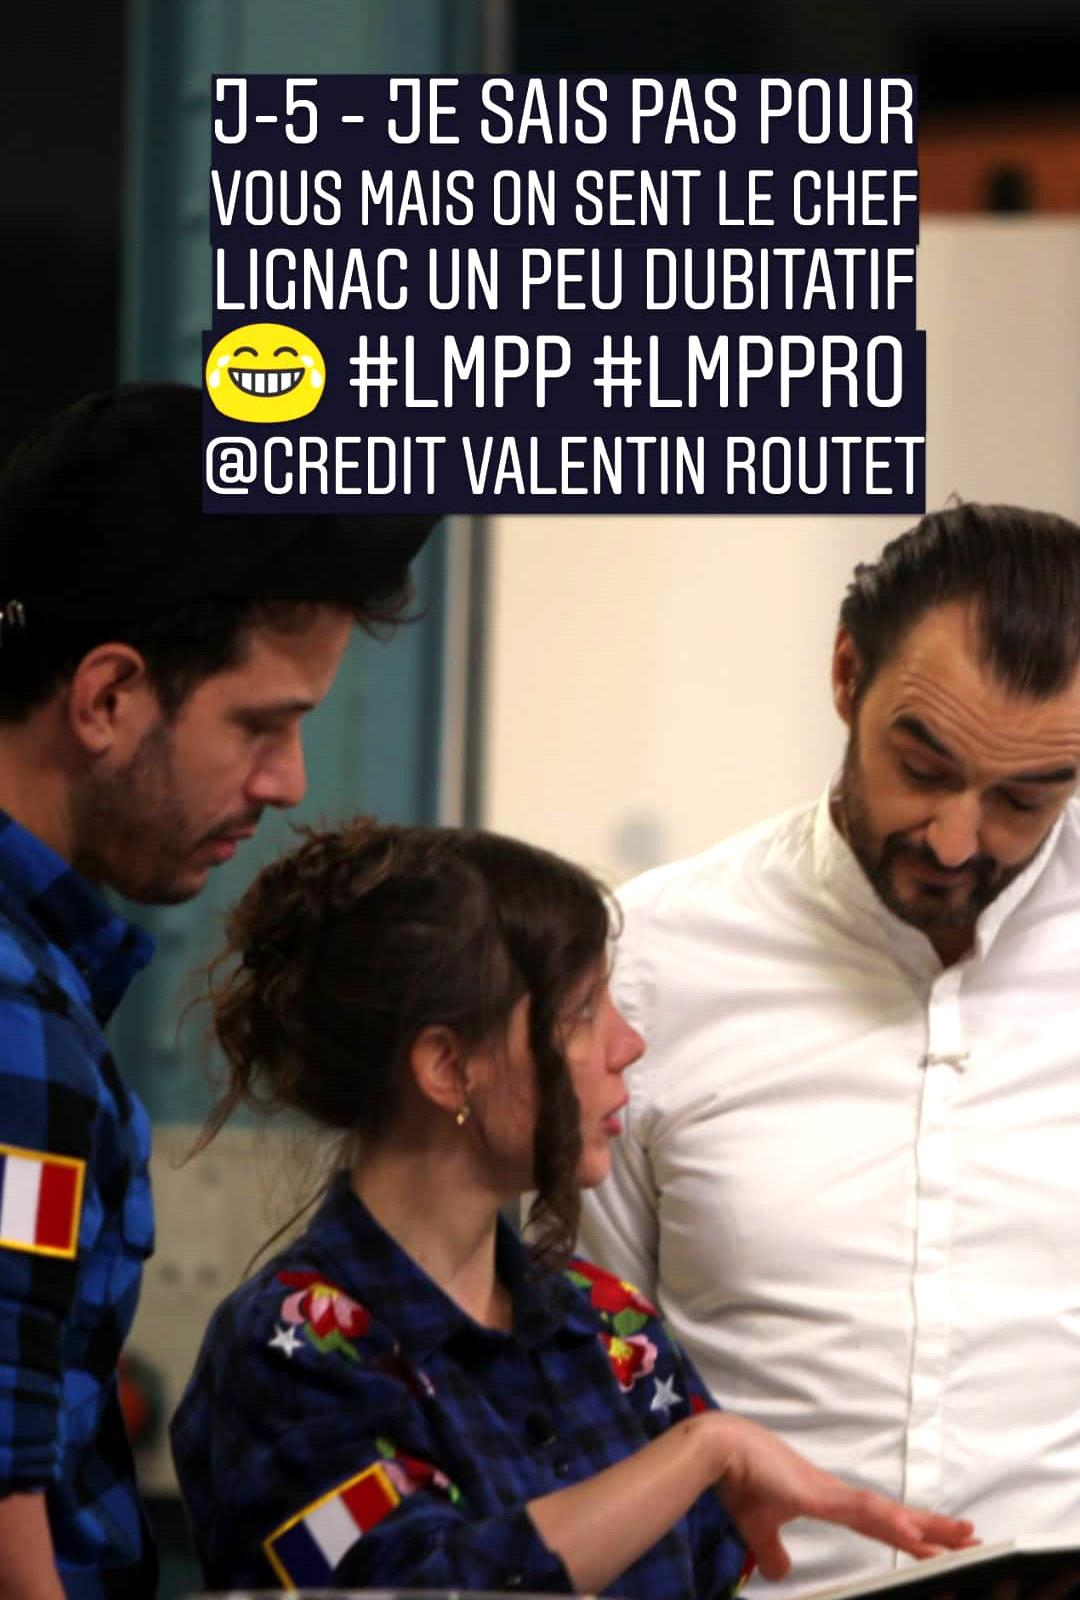 lmpp - cyril lignac - Melanie launay, Pedro leon